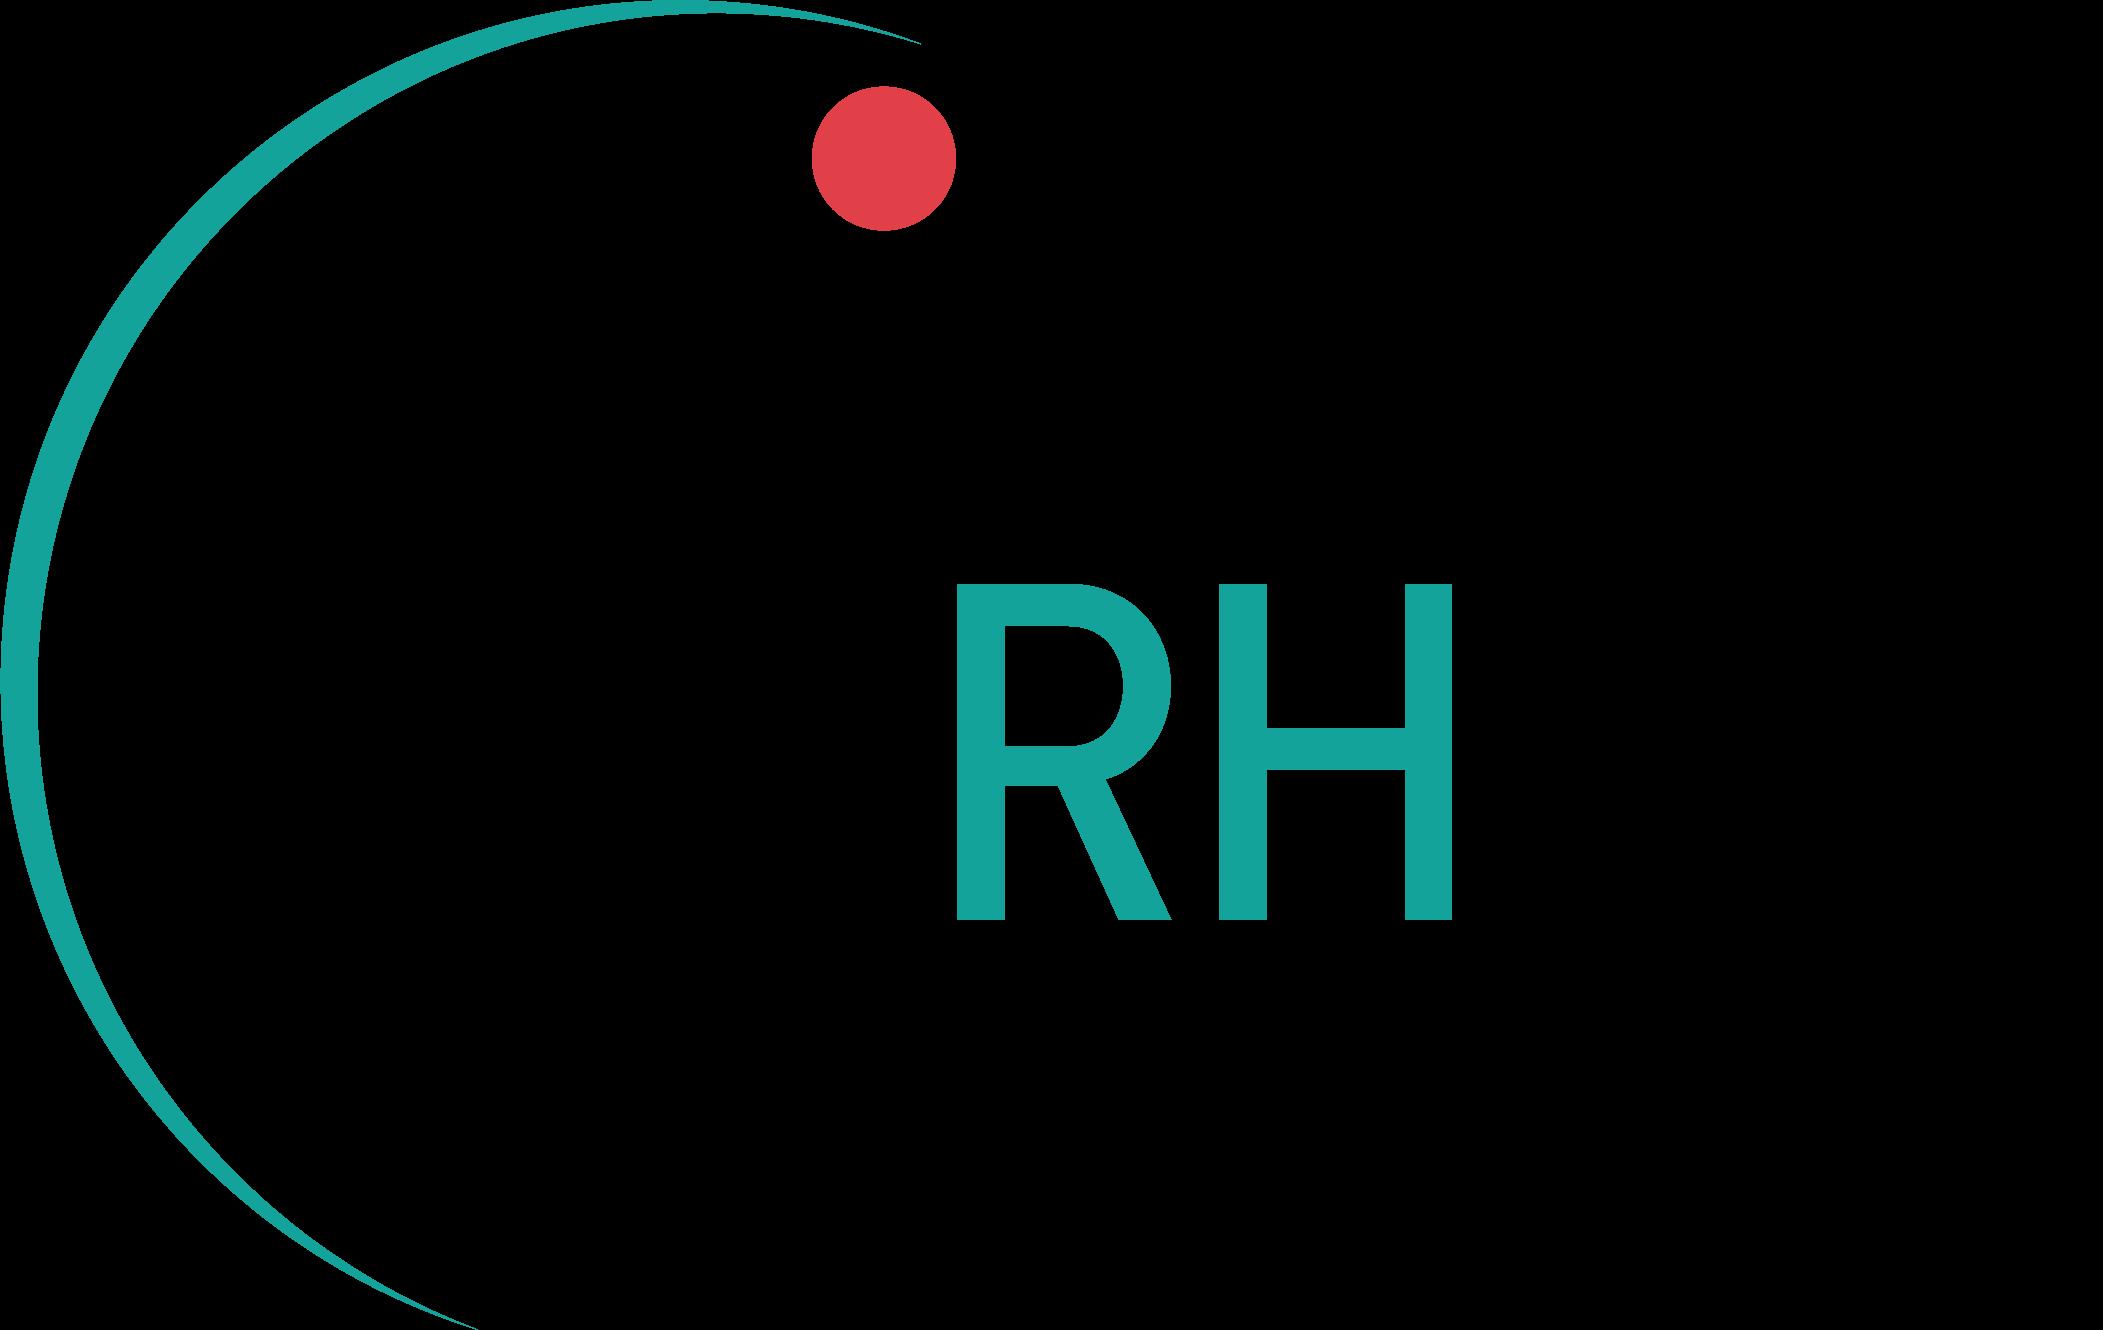 Graines de RH & CIE